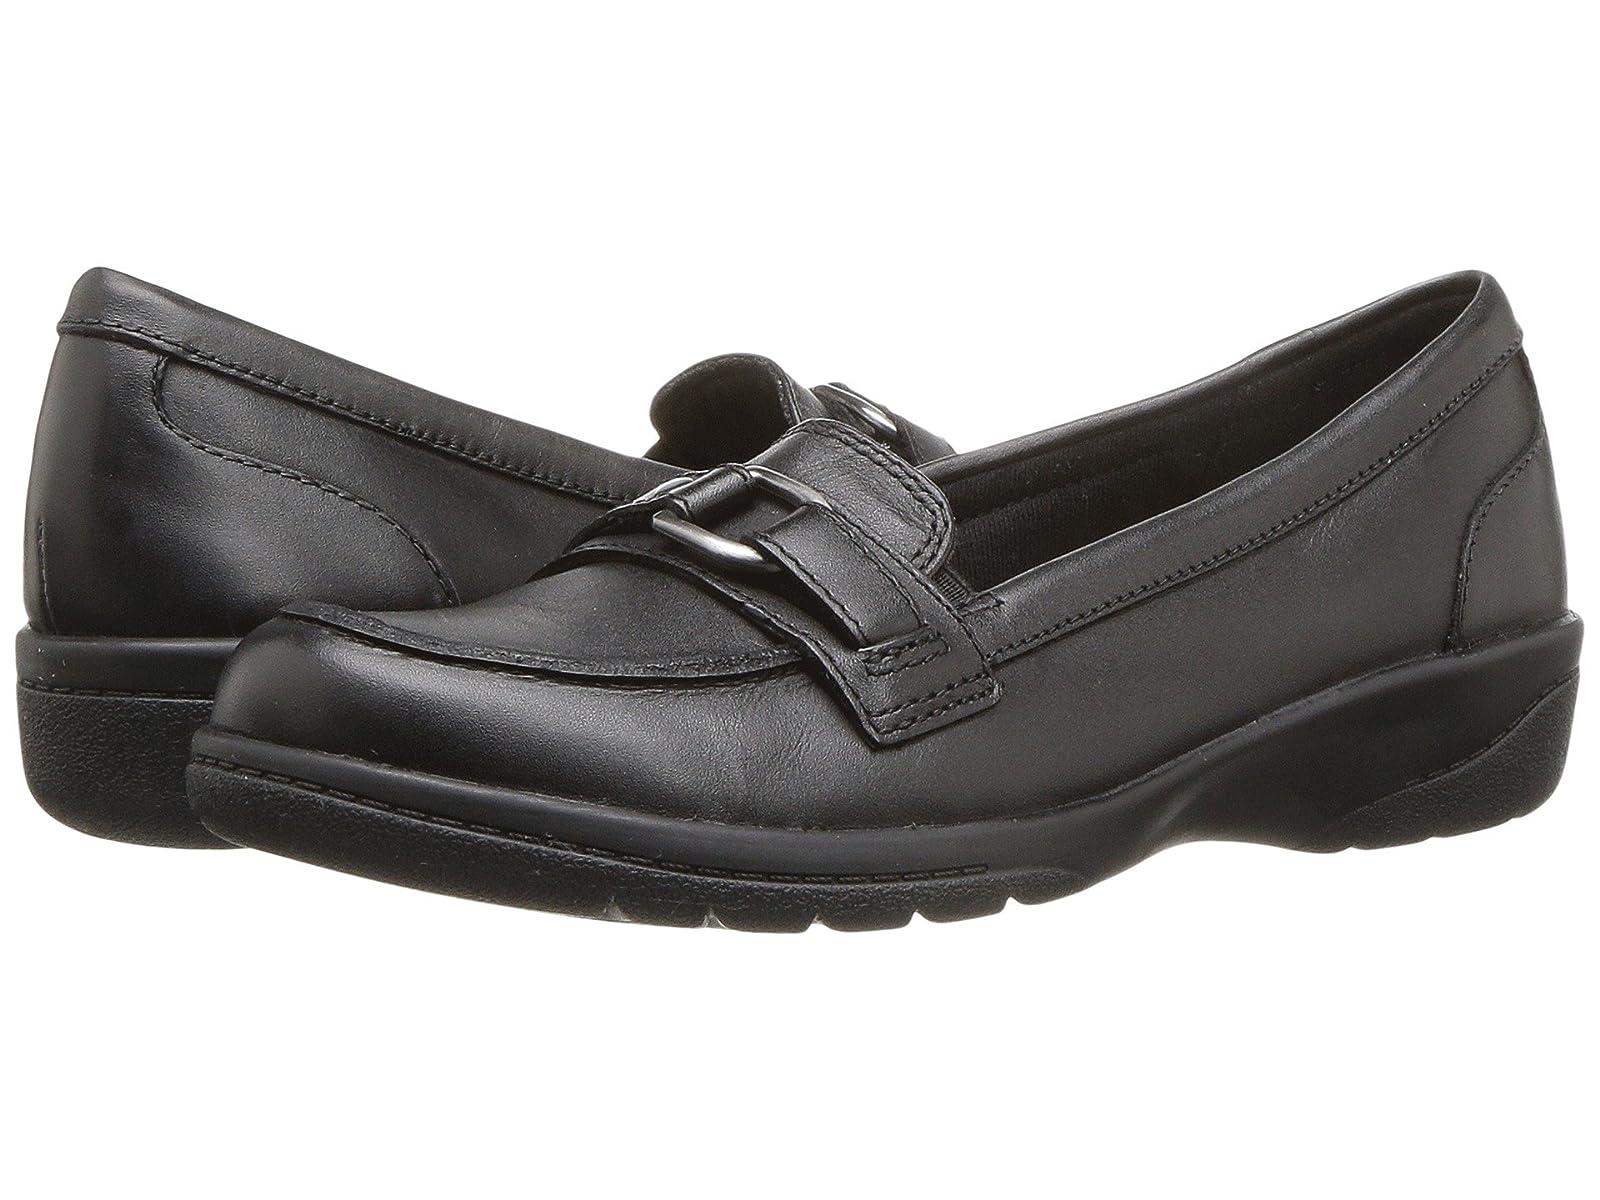 Clarks Cheyn MarieCheap and distinctive eye-catching shoes